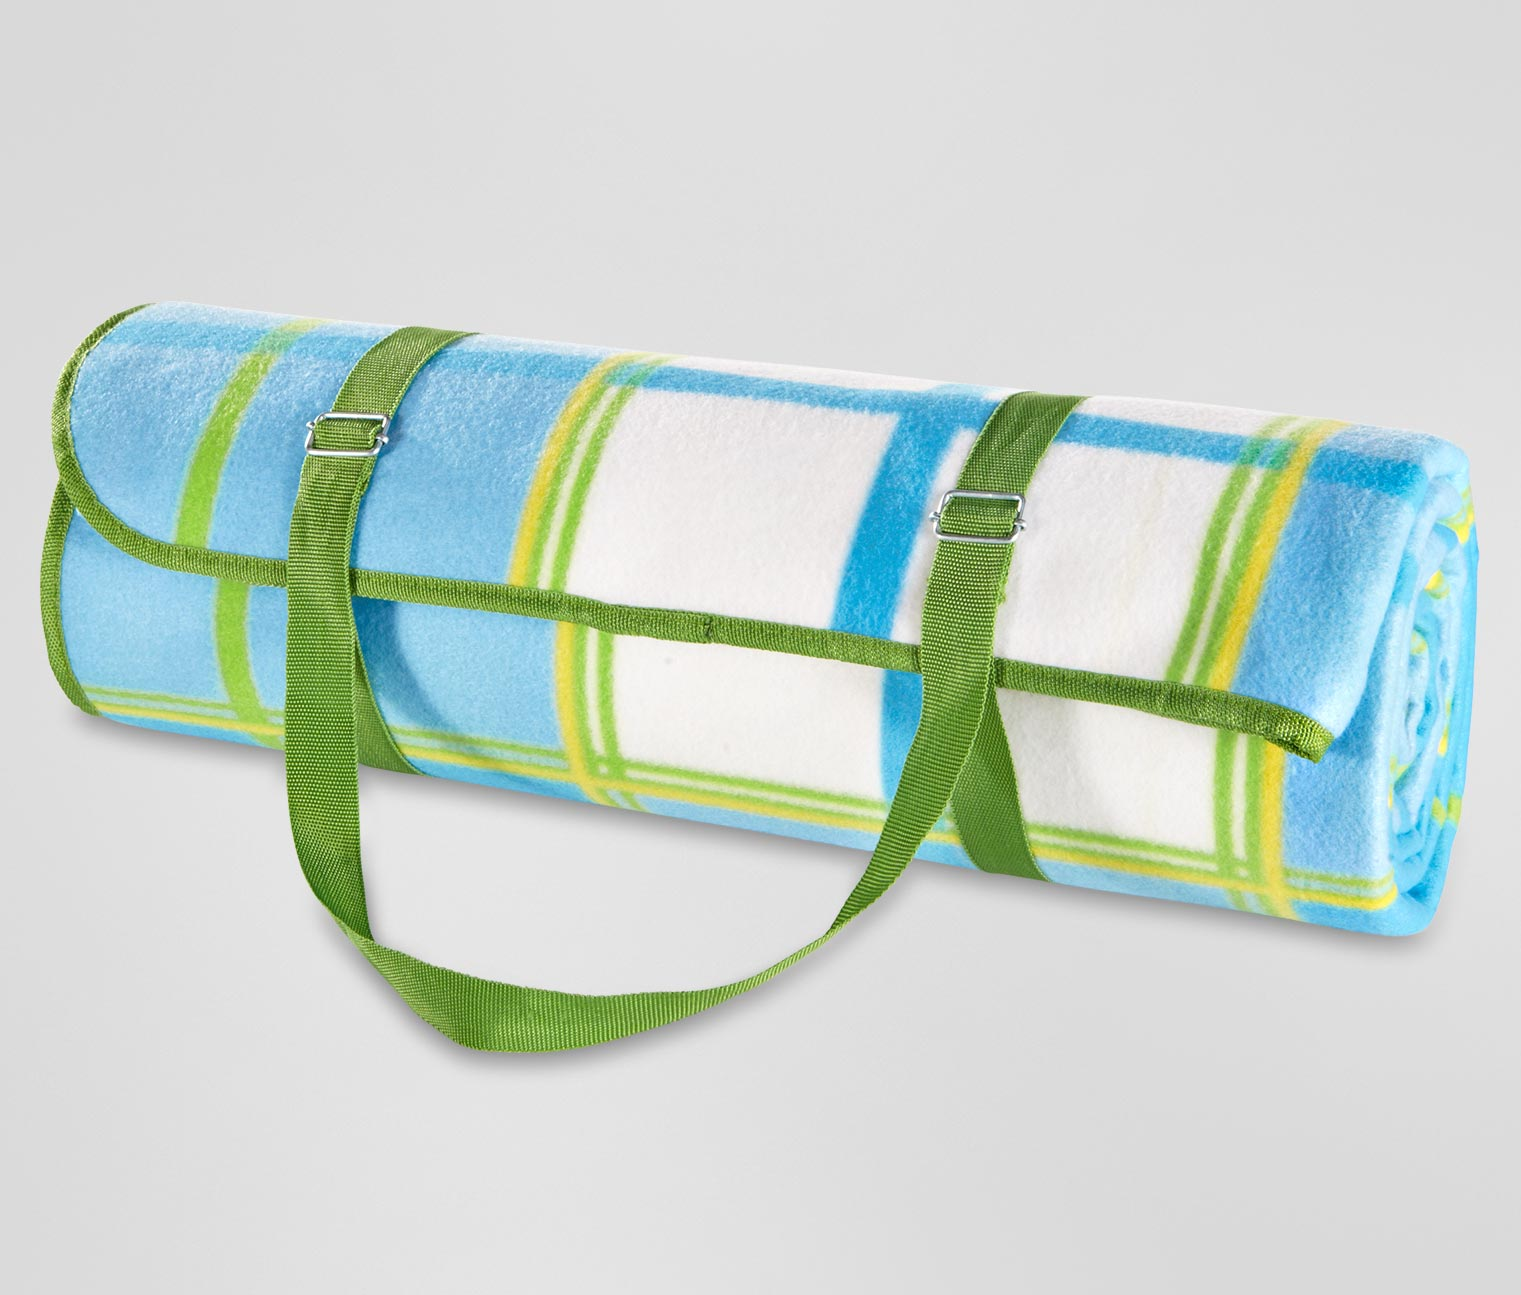 xxl picknickdecke 200 x 200 tcm tchibo ebay. Black Bedroom Furniture Sets. Home Design Ideas